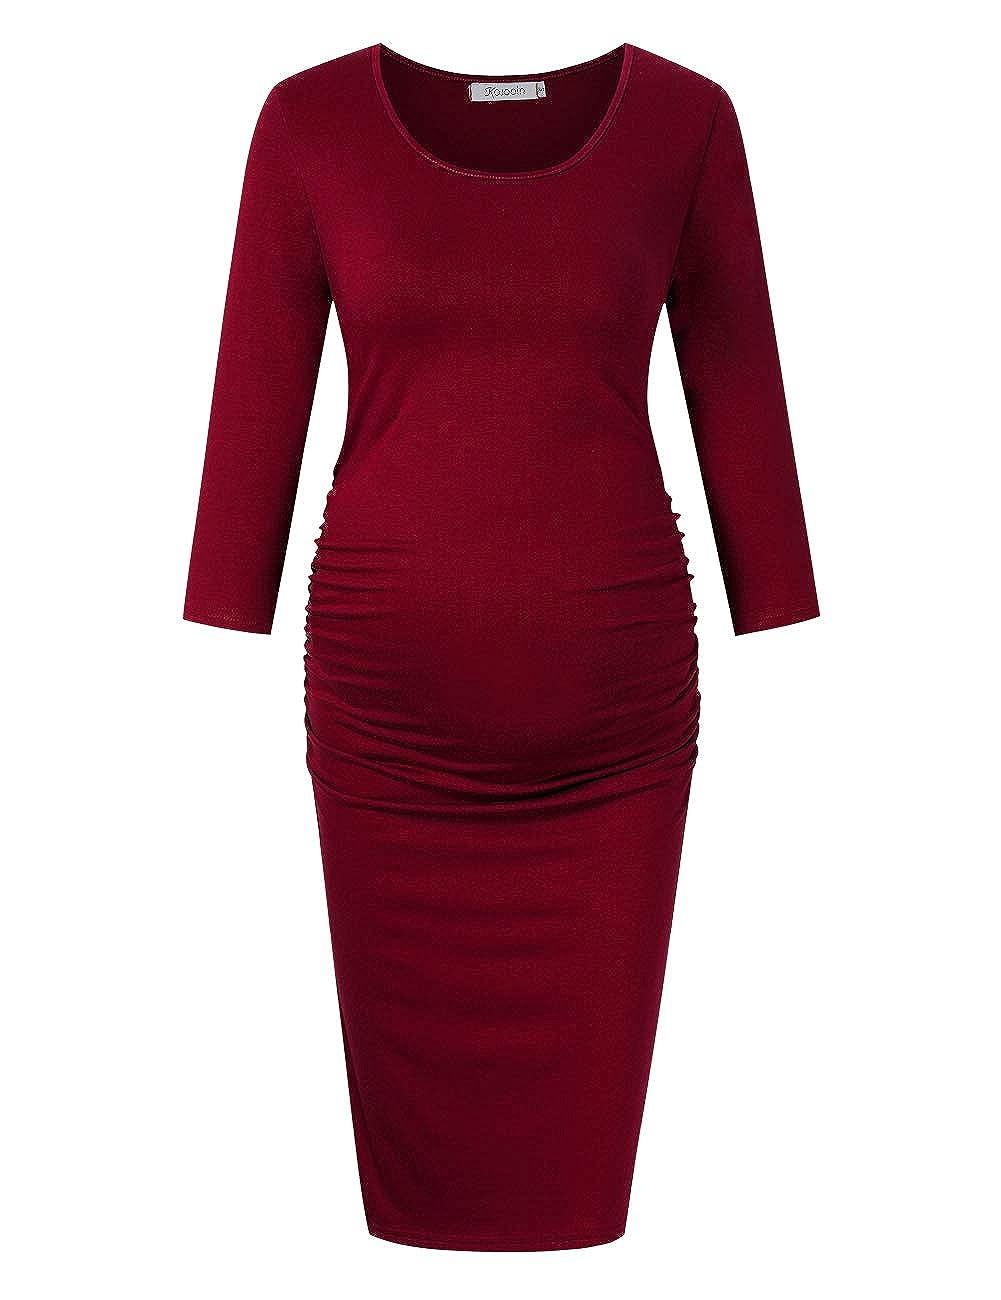 KOJOOIN Damen Umstandskleid Schwangerschafts Kleid Umstandsmode Elegantes Kleid f/ür Schwangere Lange /Ärmel Knielang(Verpackung MEHRWEG)